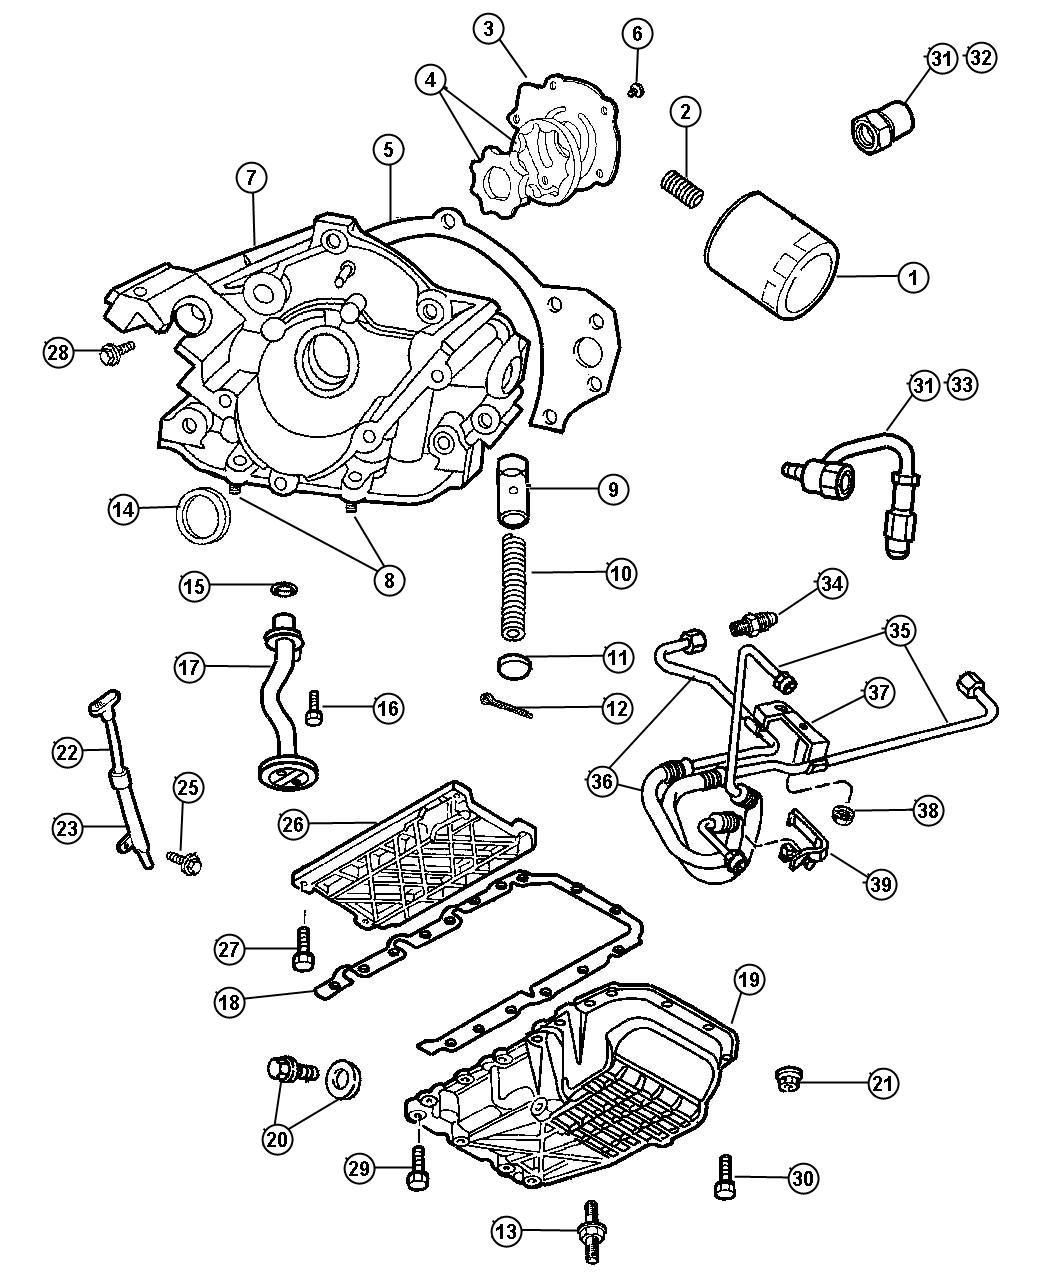 hight resolution of 1998 dodge stratus wiring diagram